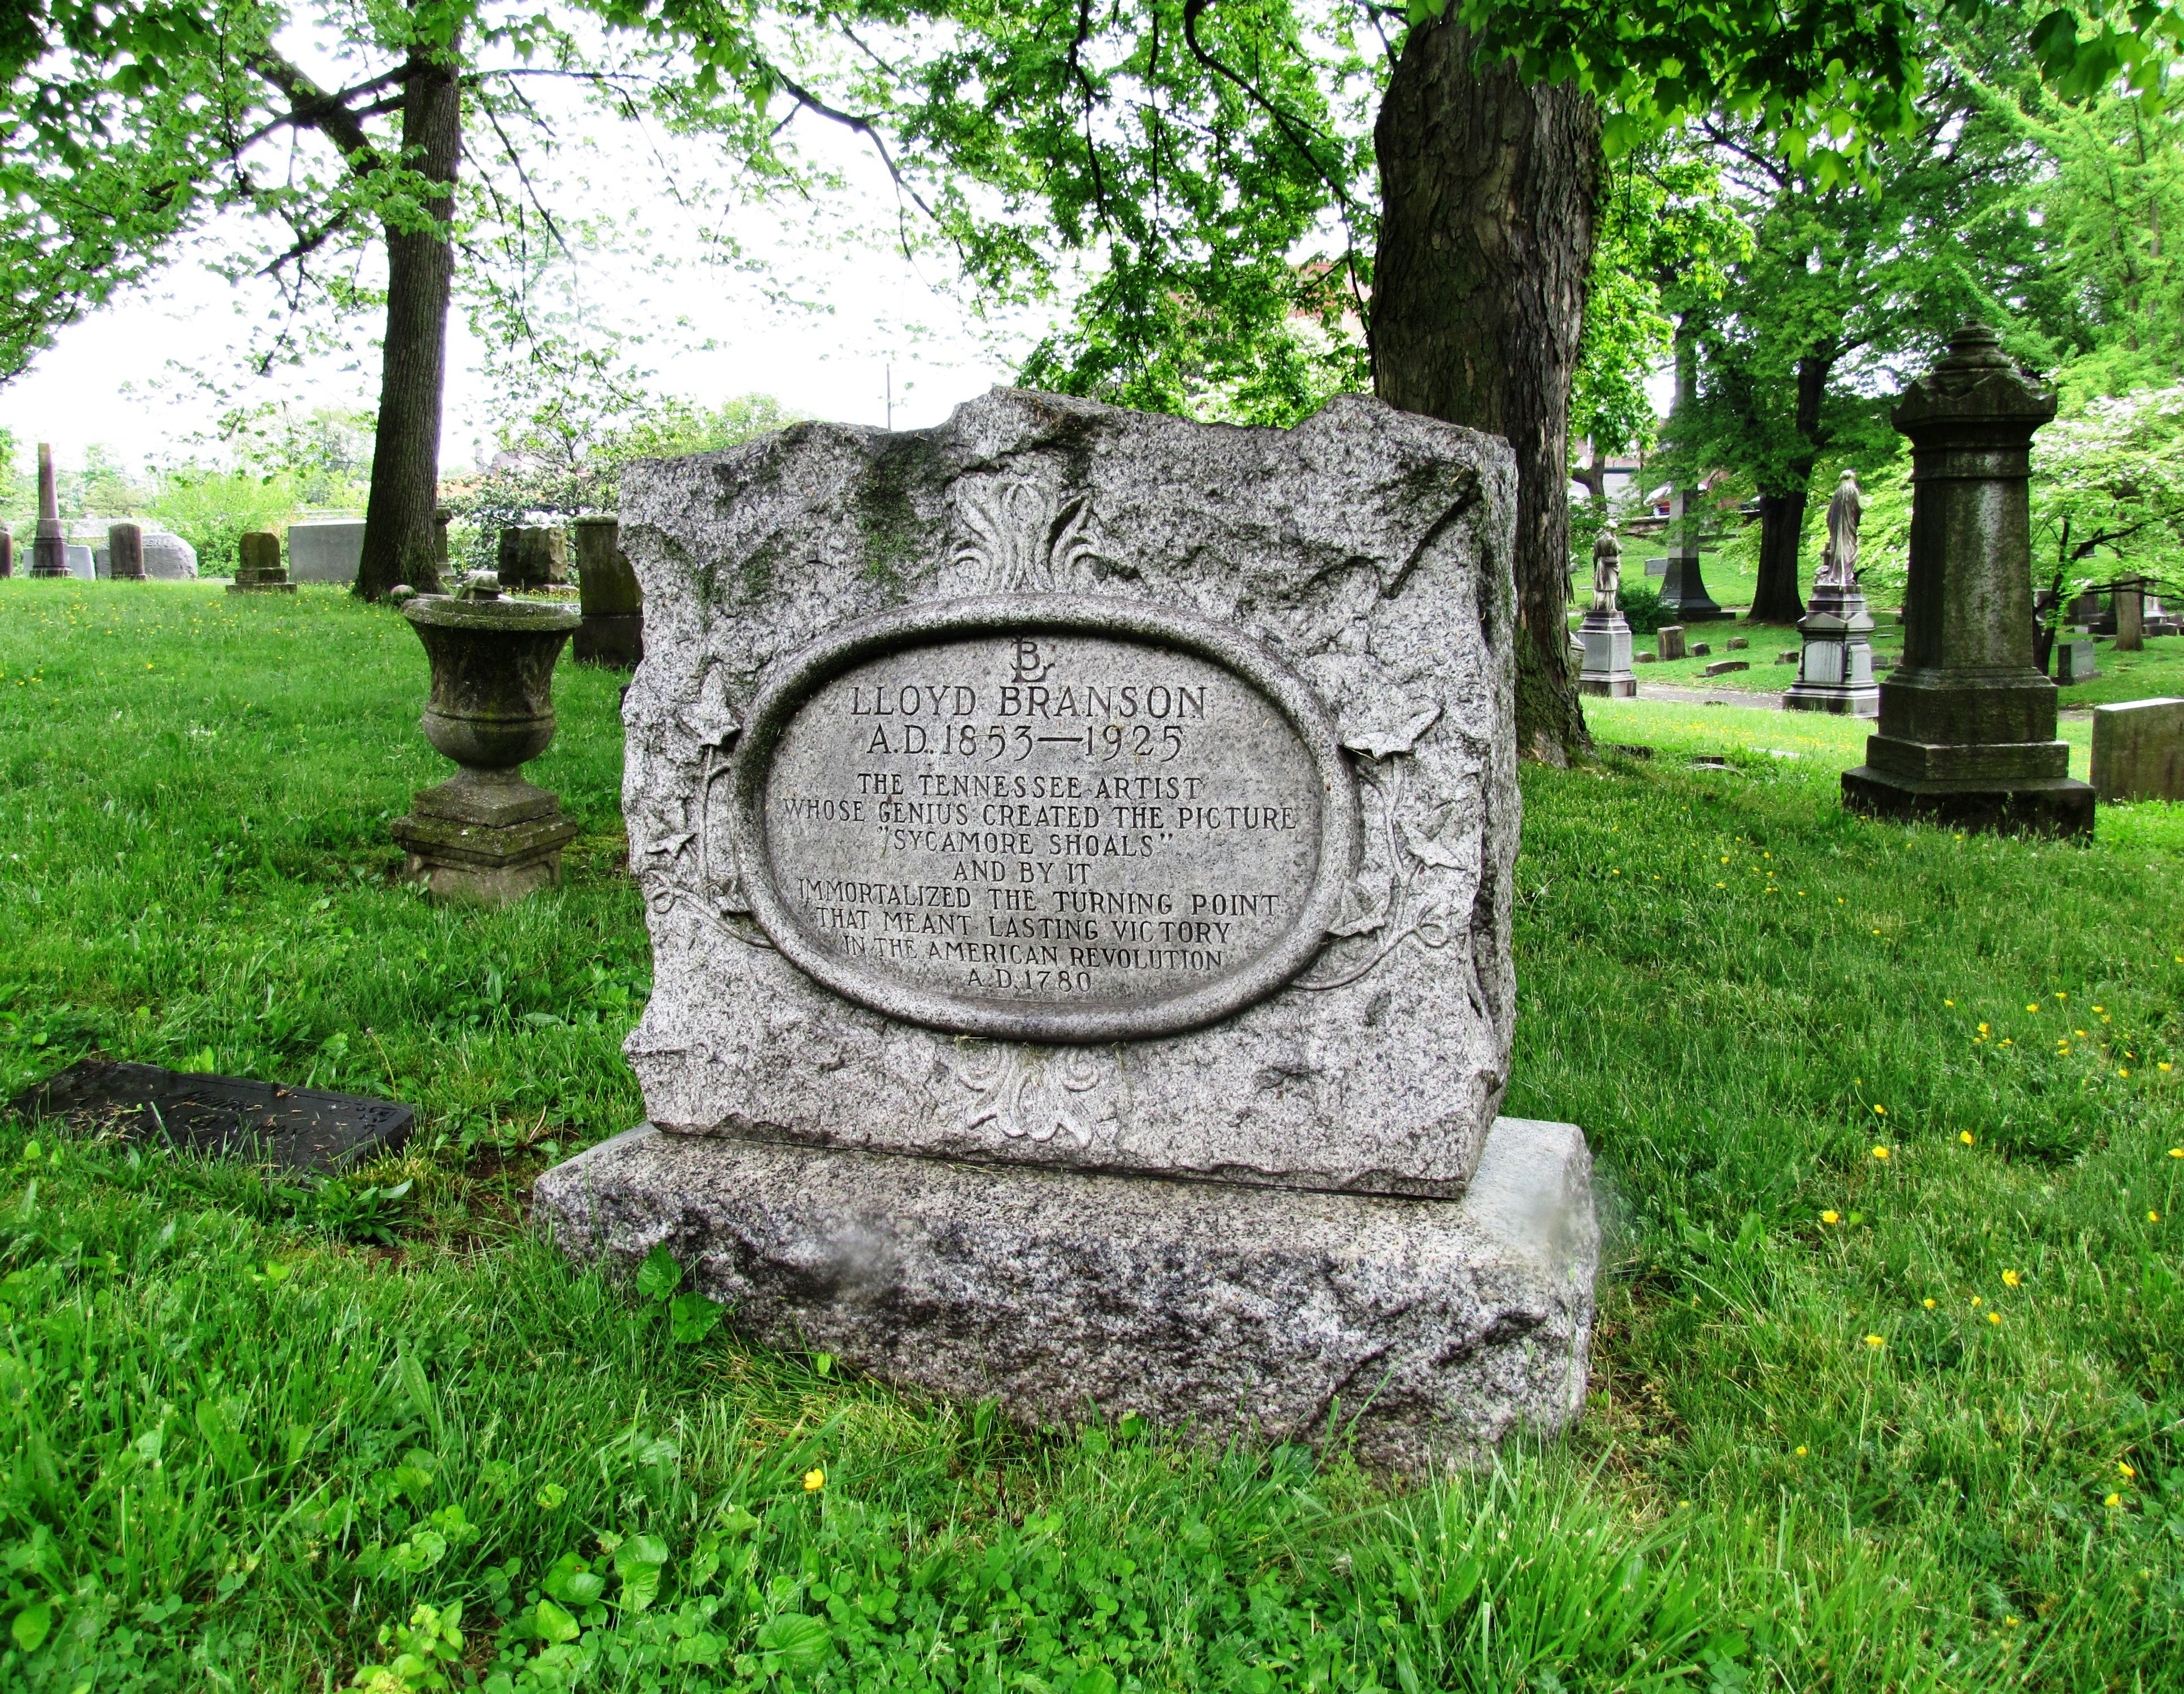 File:Lloyd-branson-grave-old-gray-tn1.jpg - Wikimedia Commons